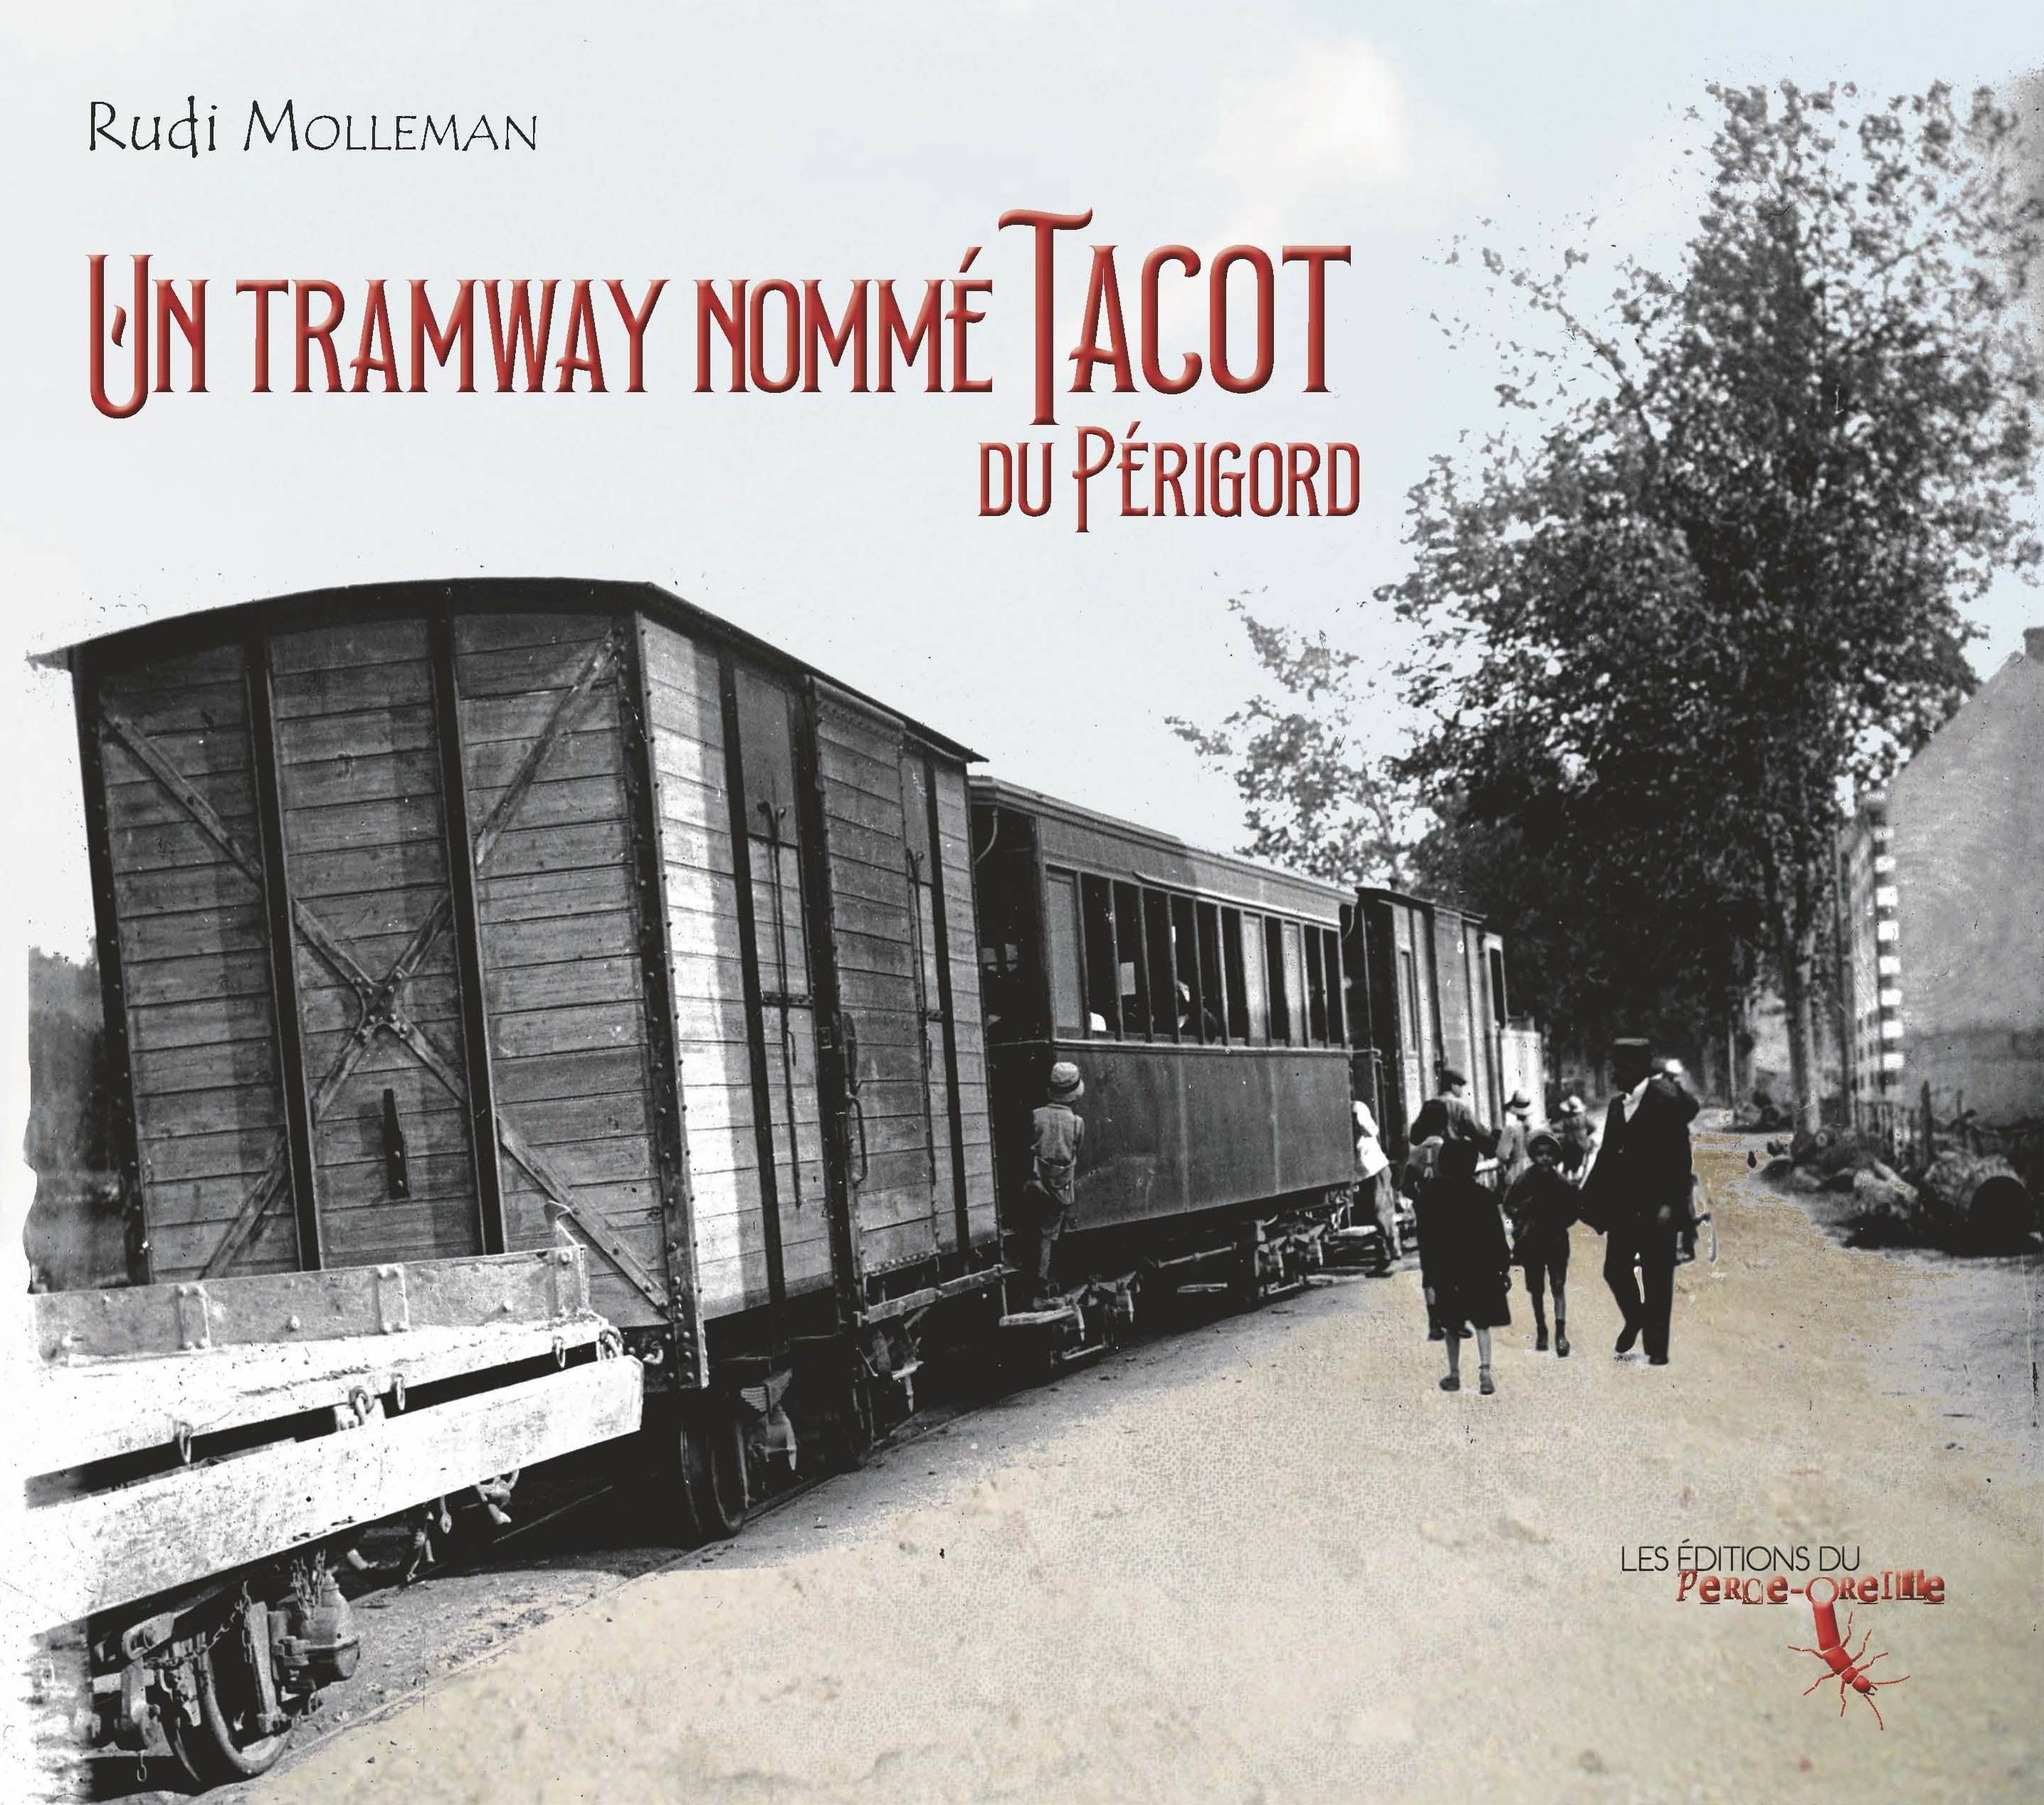 Un tramway nommé Tacot du Périgord